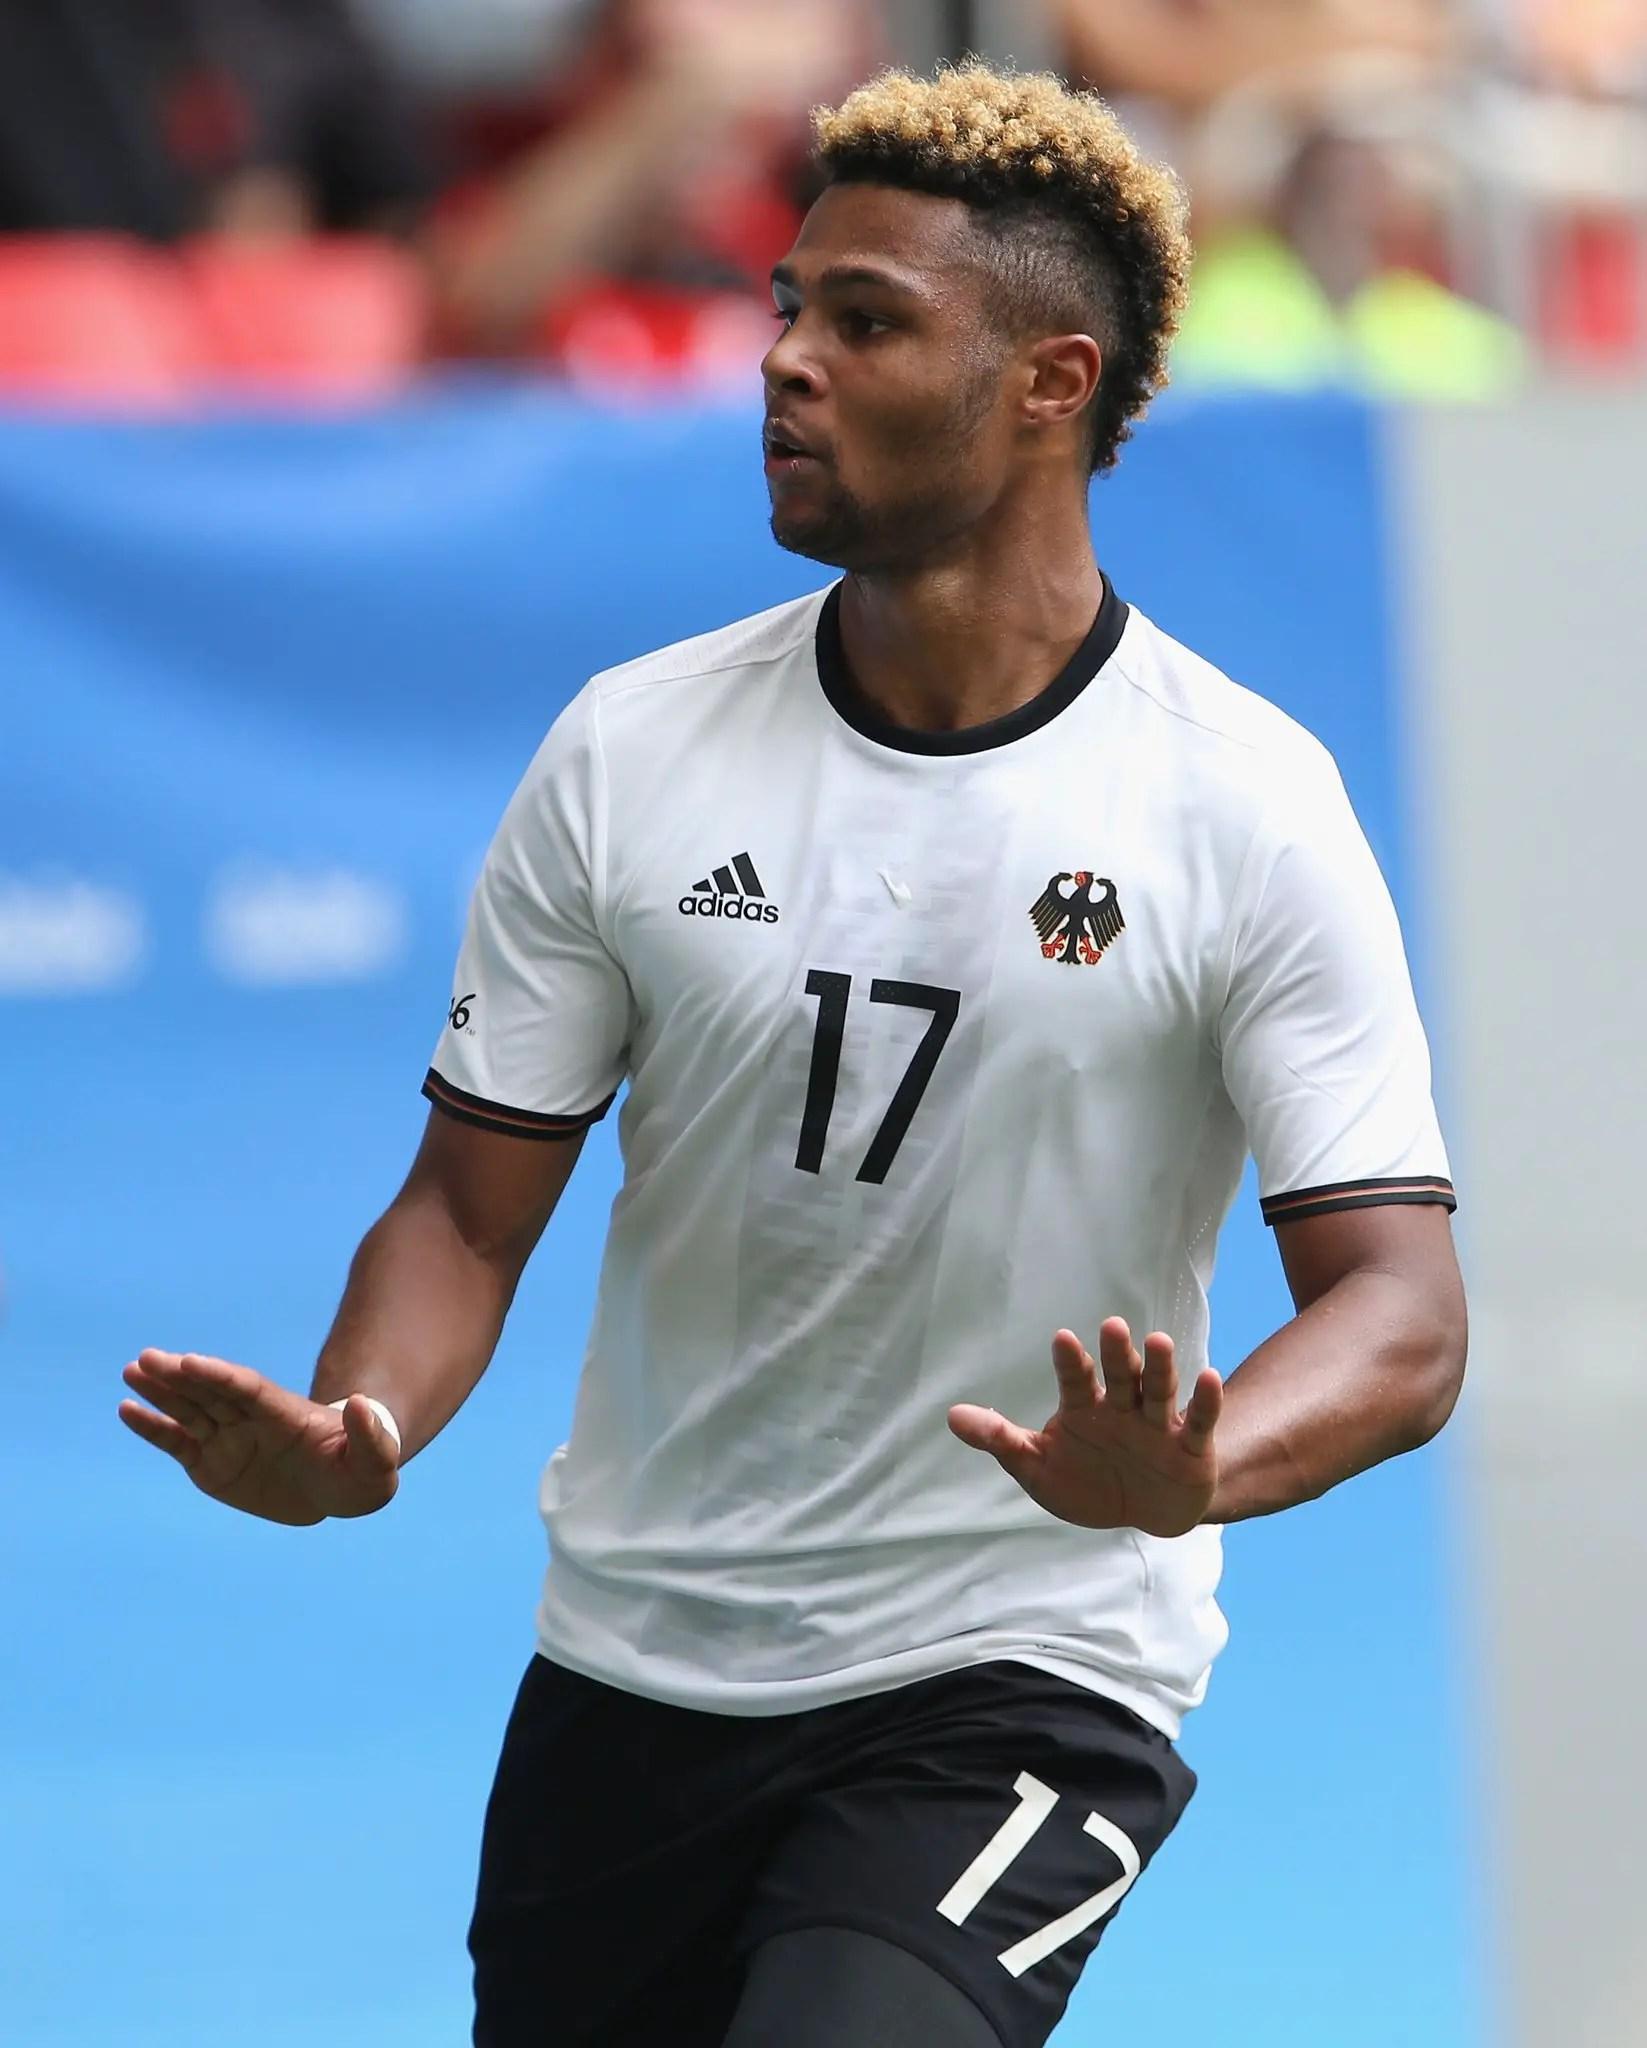 Arsenal Star Gnabry Backs Germany To Beat Olympic Eagles